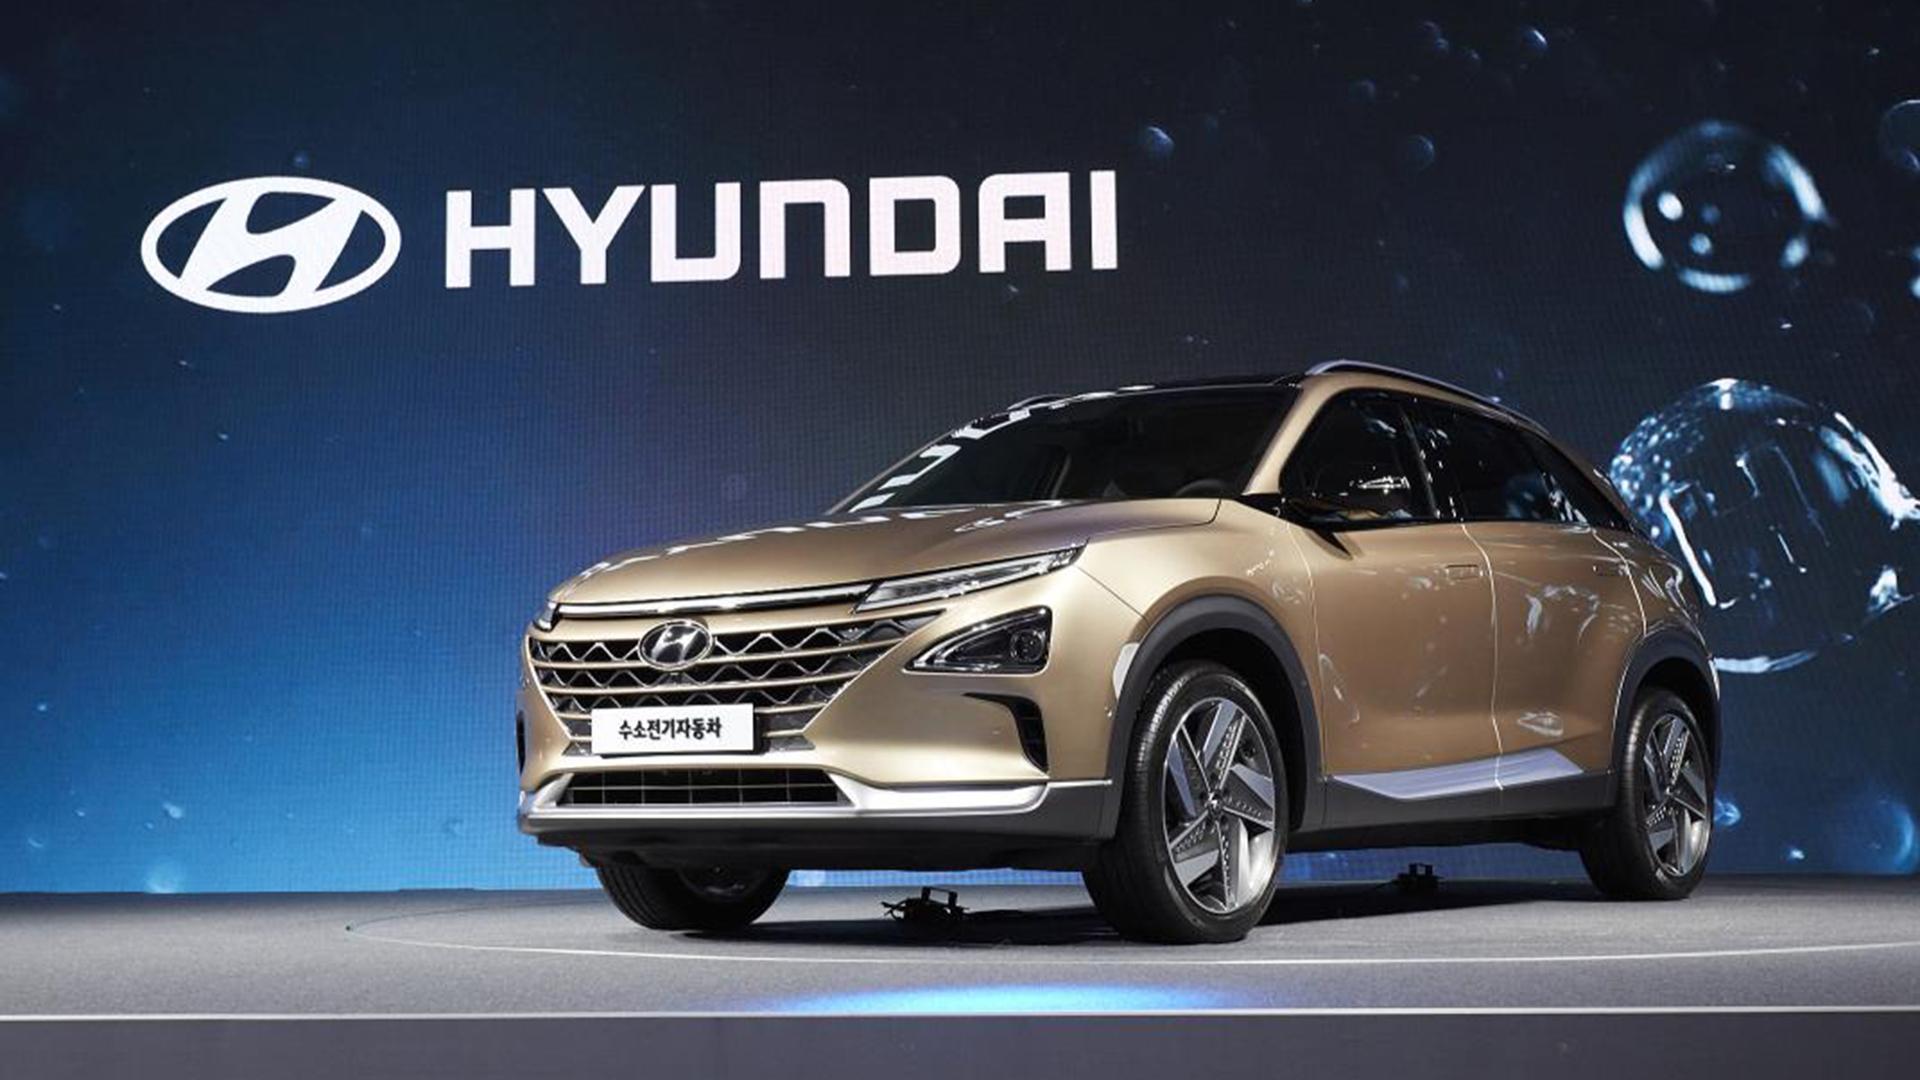 Hyundai previews its next hydrogen fuel-cell car | Auto ...